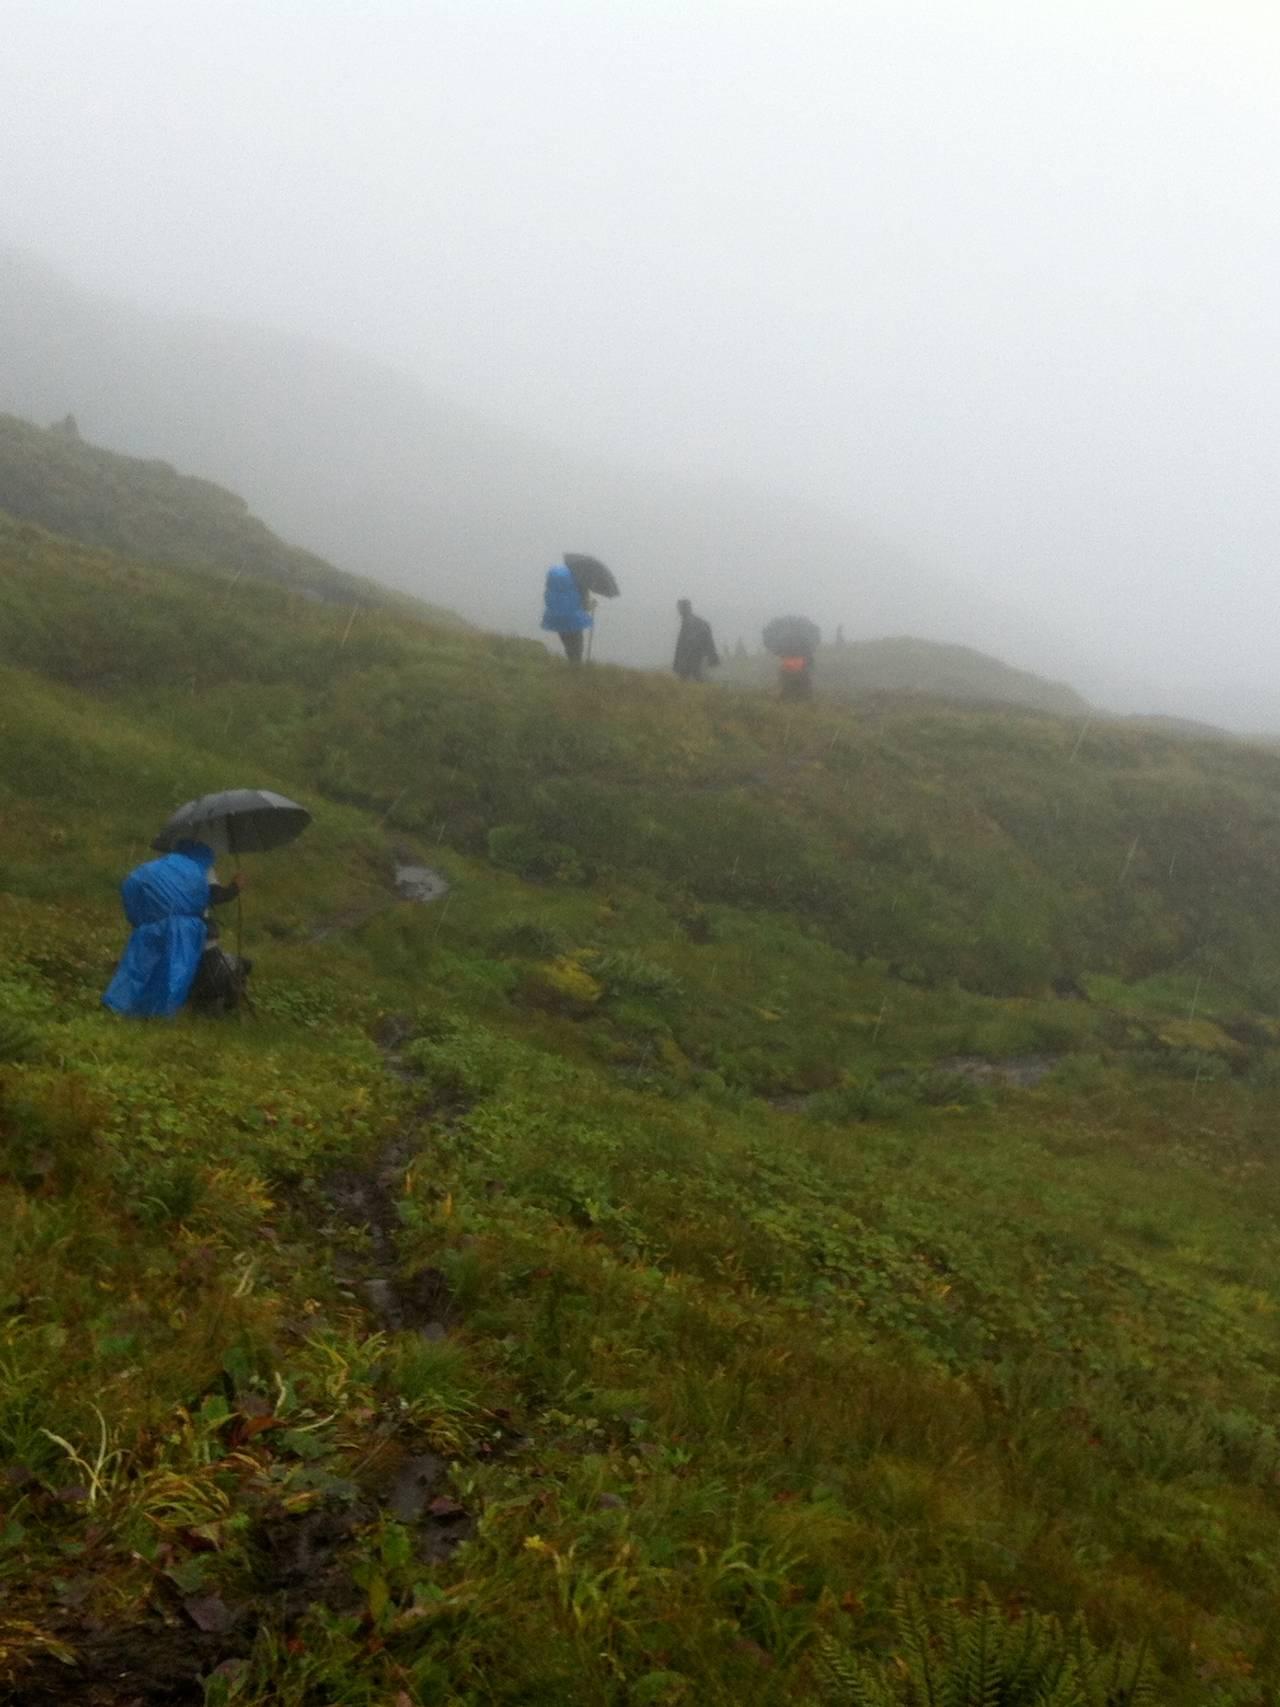 Fjellside i Himalaya, folk klatrer med paraplyer på pilegrimsferd